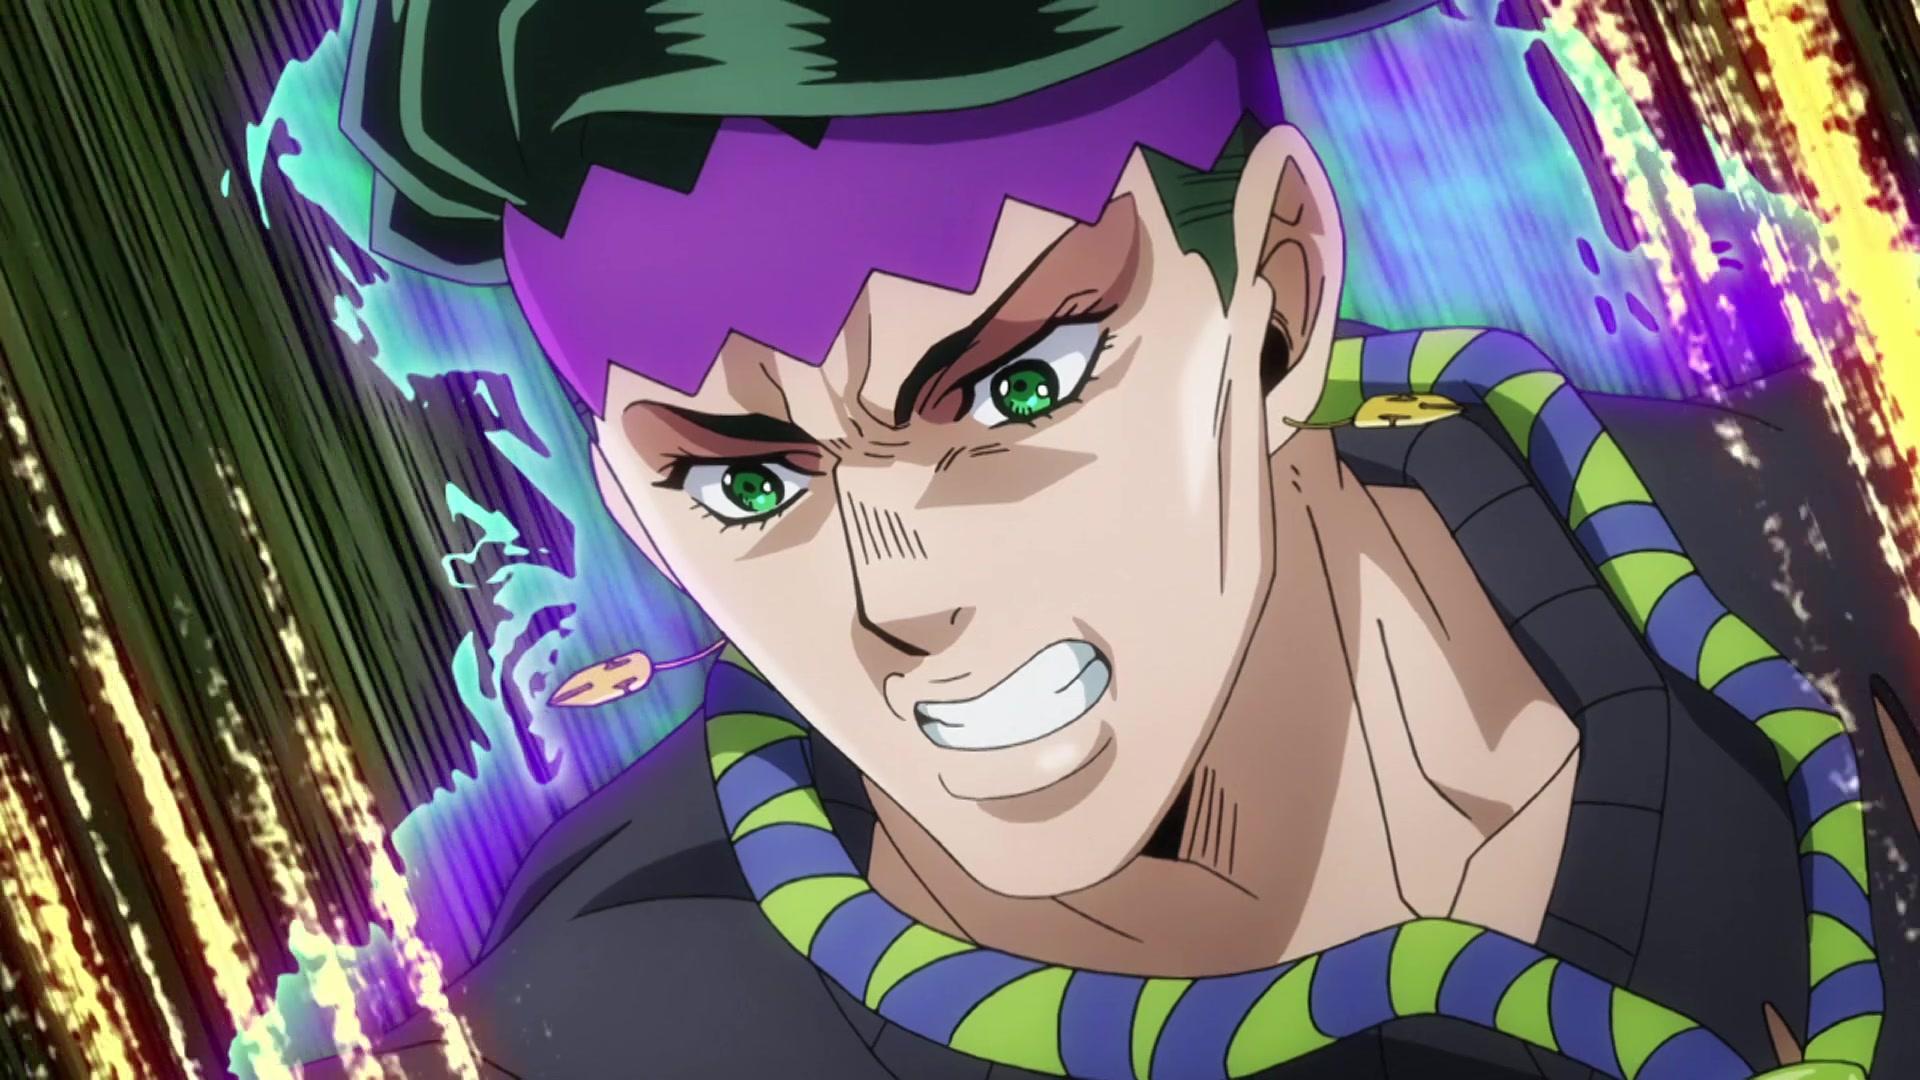 JoJo's Bizarre Adventure: Diamond is Unbreakable Episode 33, July